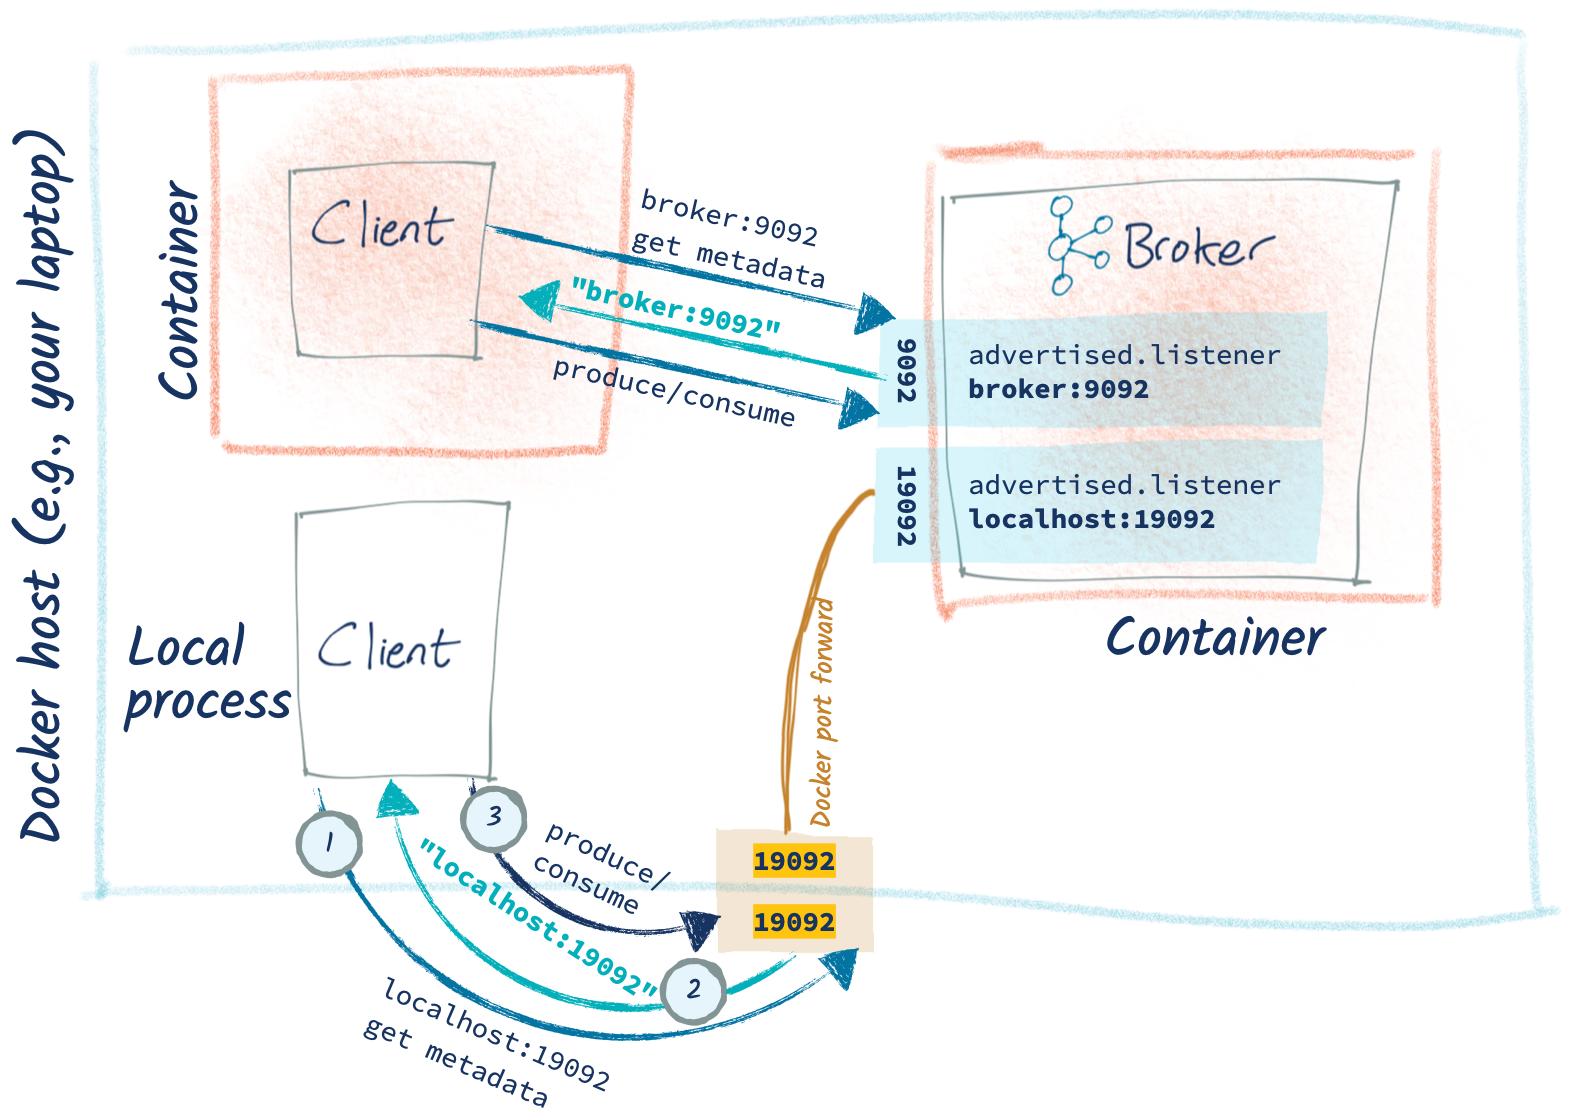 Docker host (e.g., your laptop) – Container: Client | Local process: Client | Container: Kafka broker